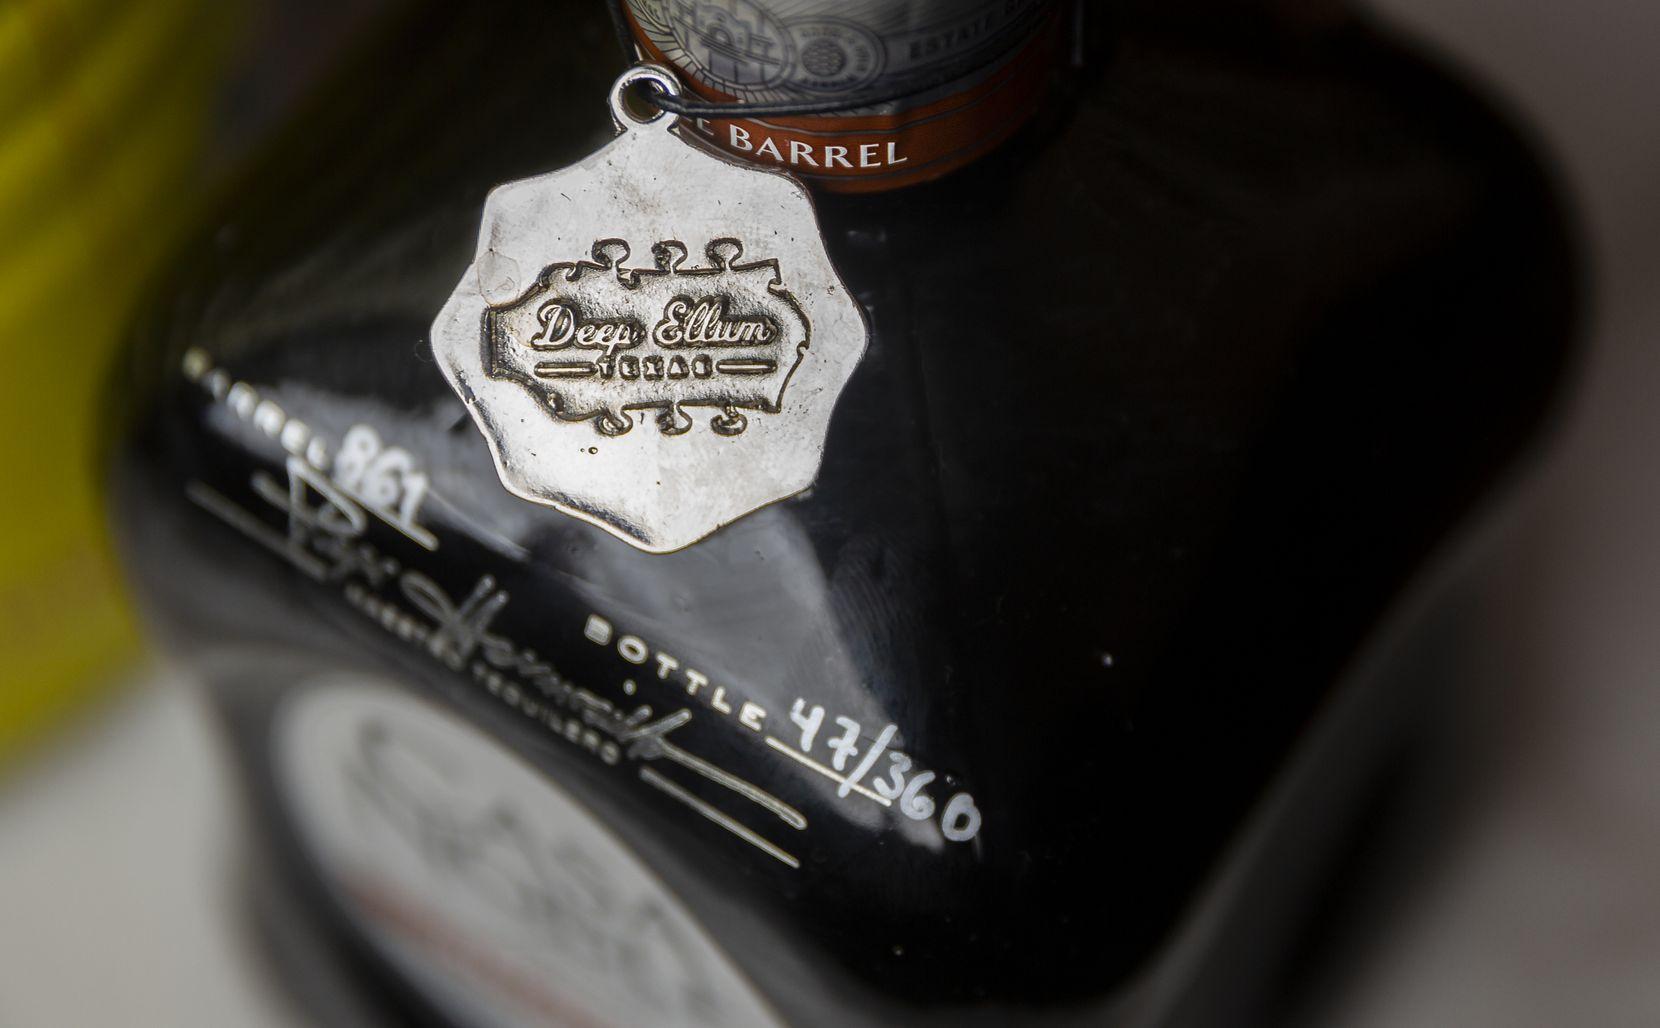 The Casa Noble Reposado Deep Ellum Edition singe barrel tequila at Shoals in Dallas